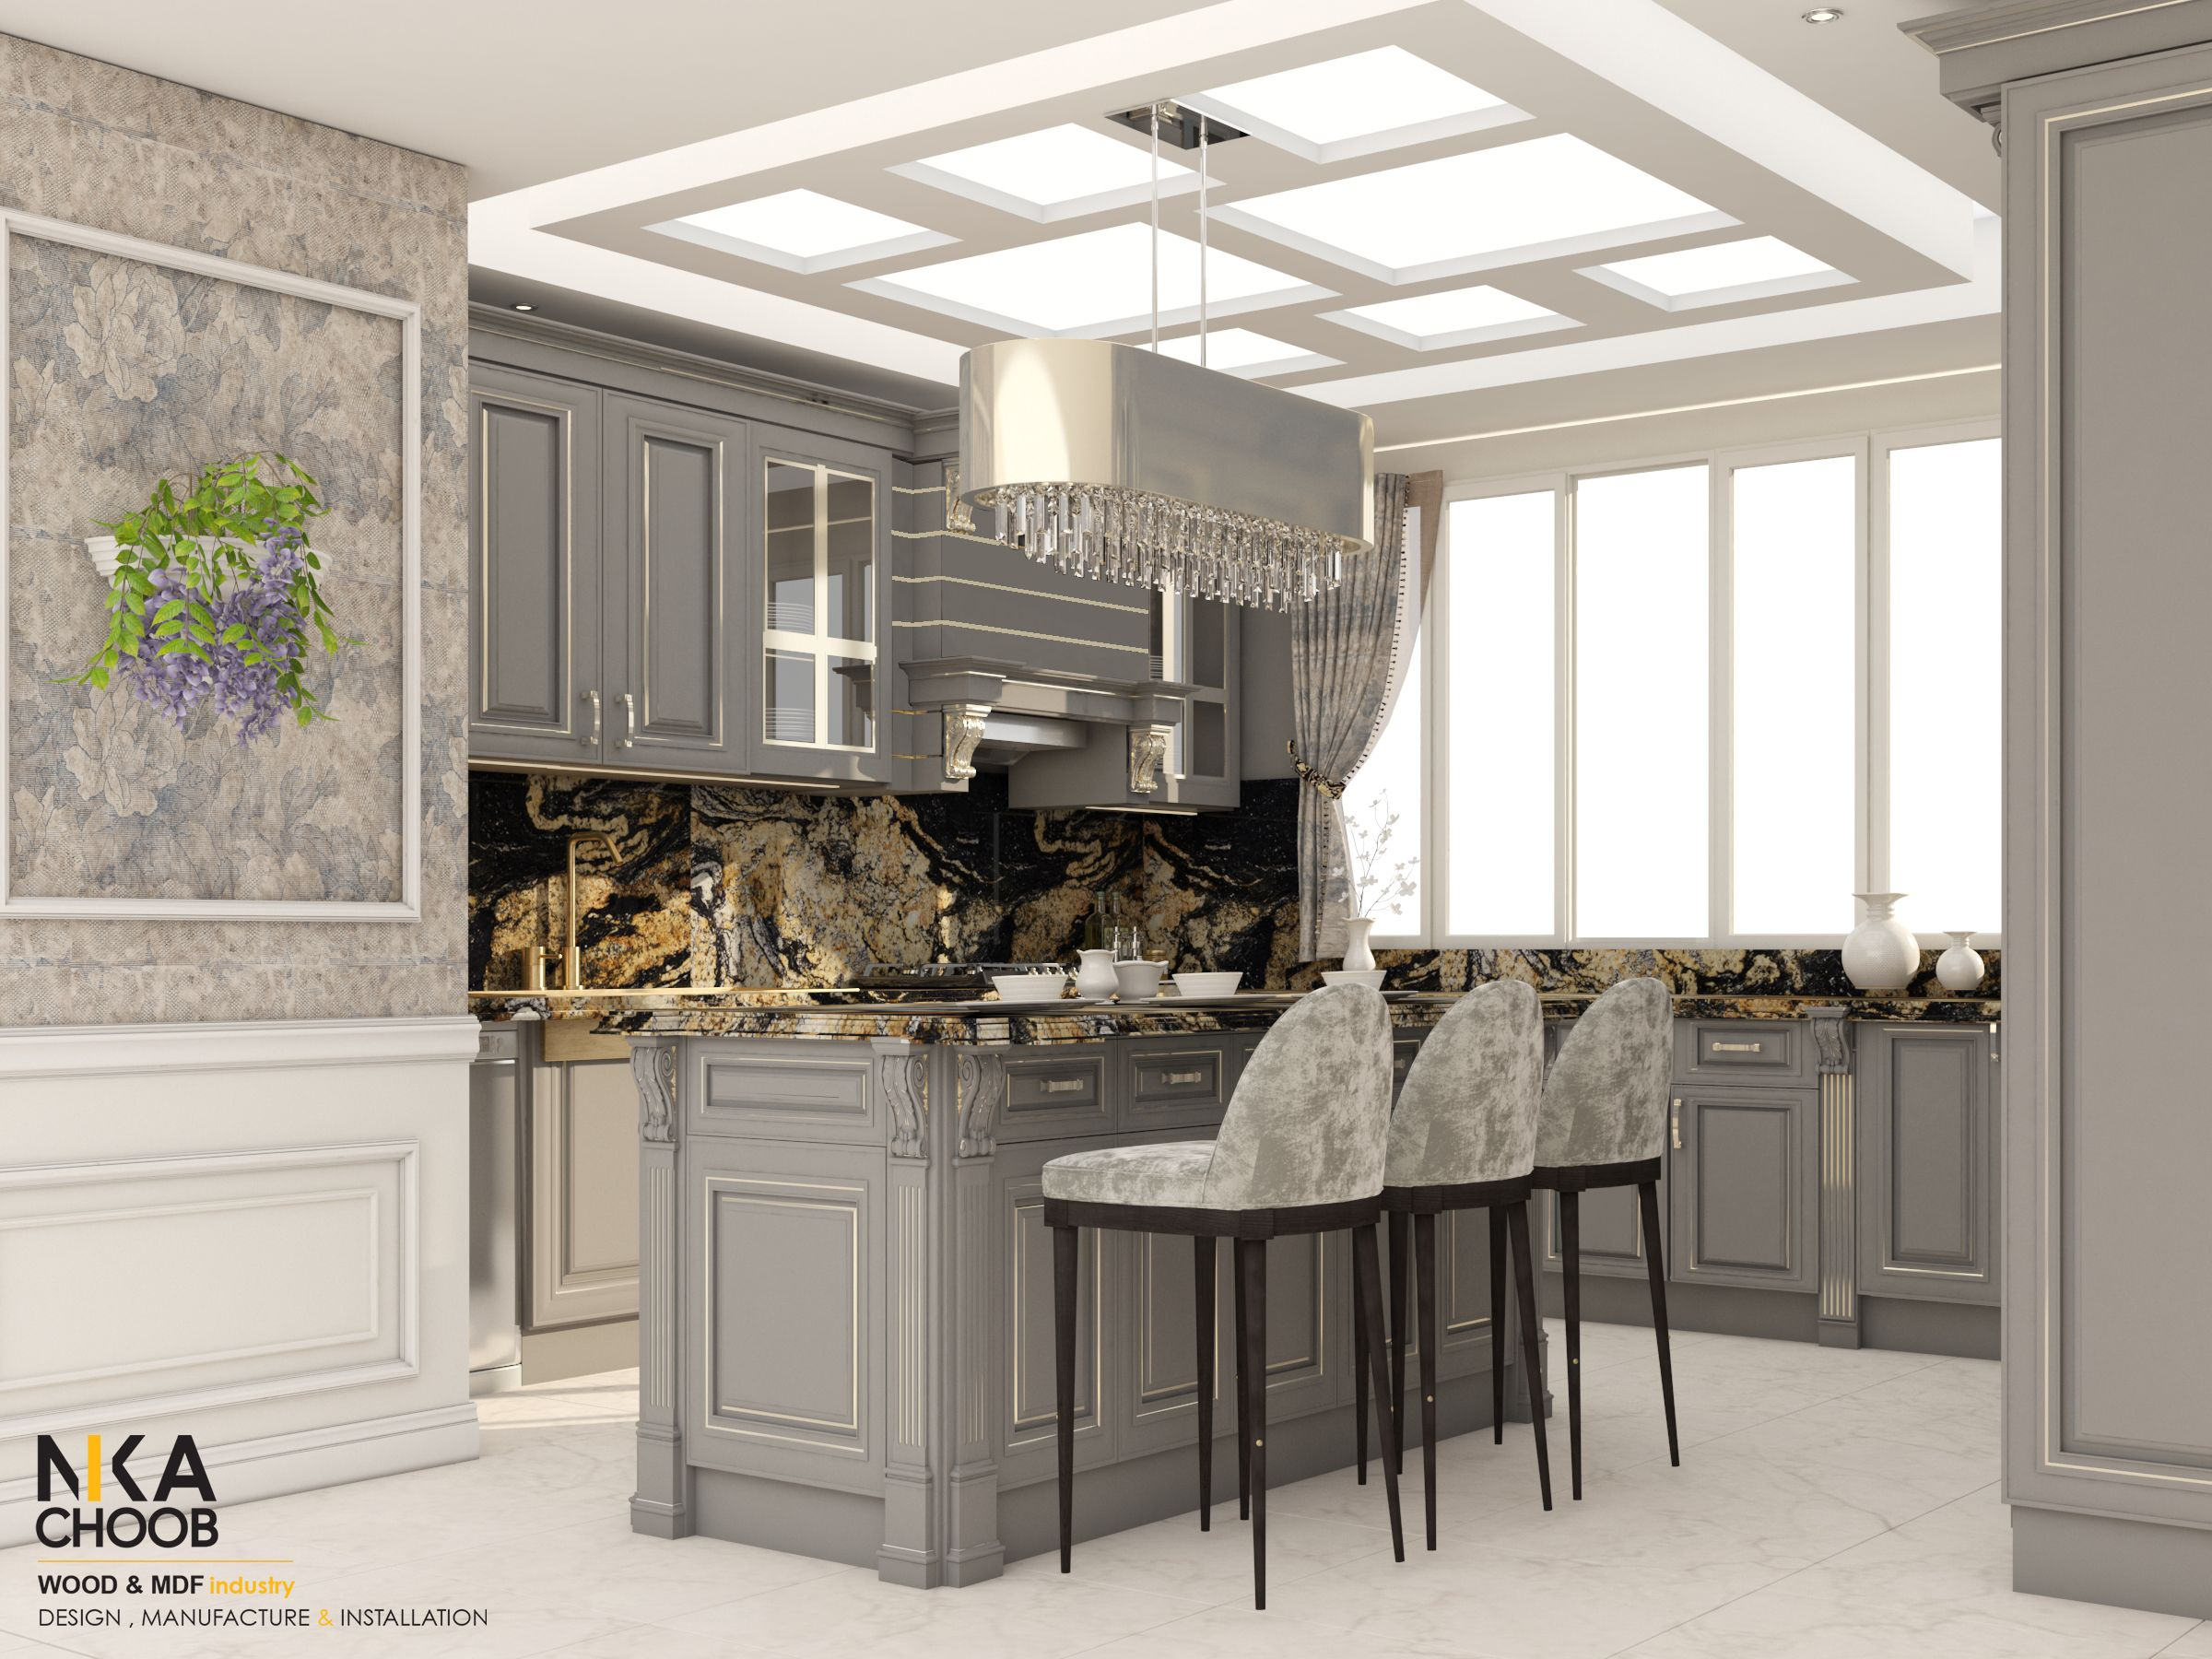 طراحی دکوراسیون منزل Home Decor Home Design